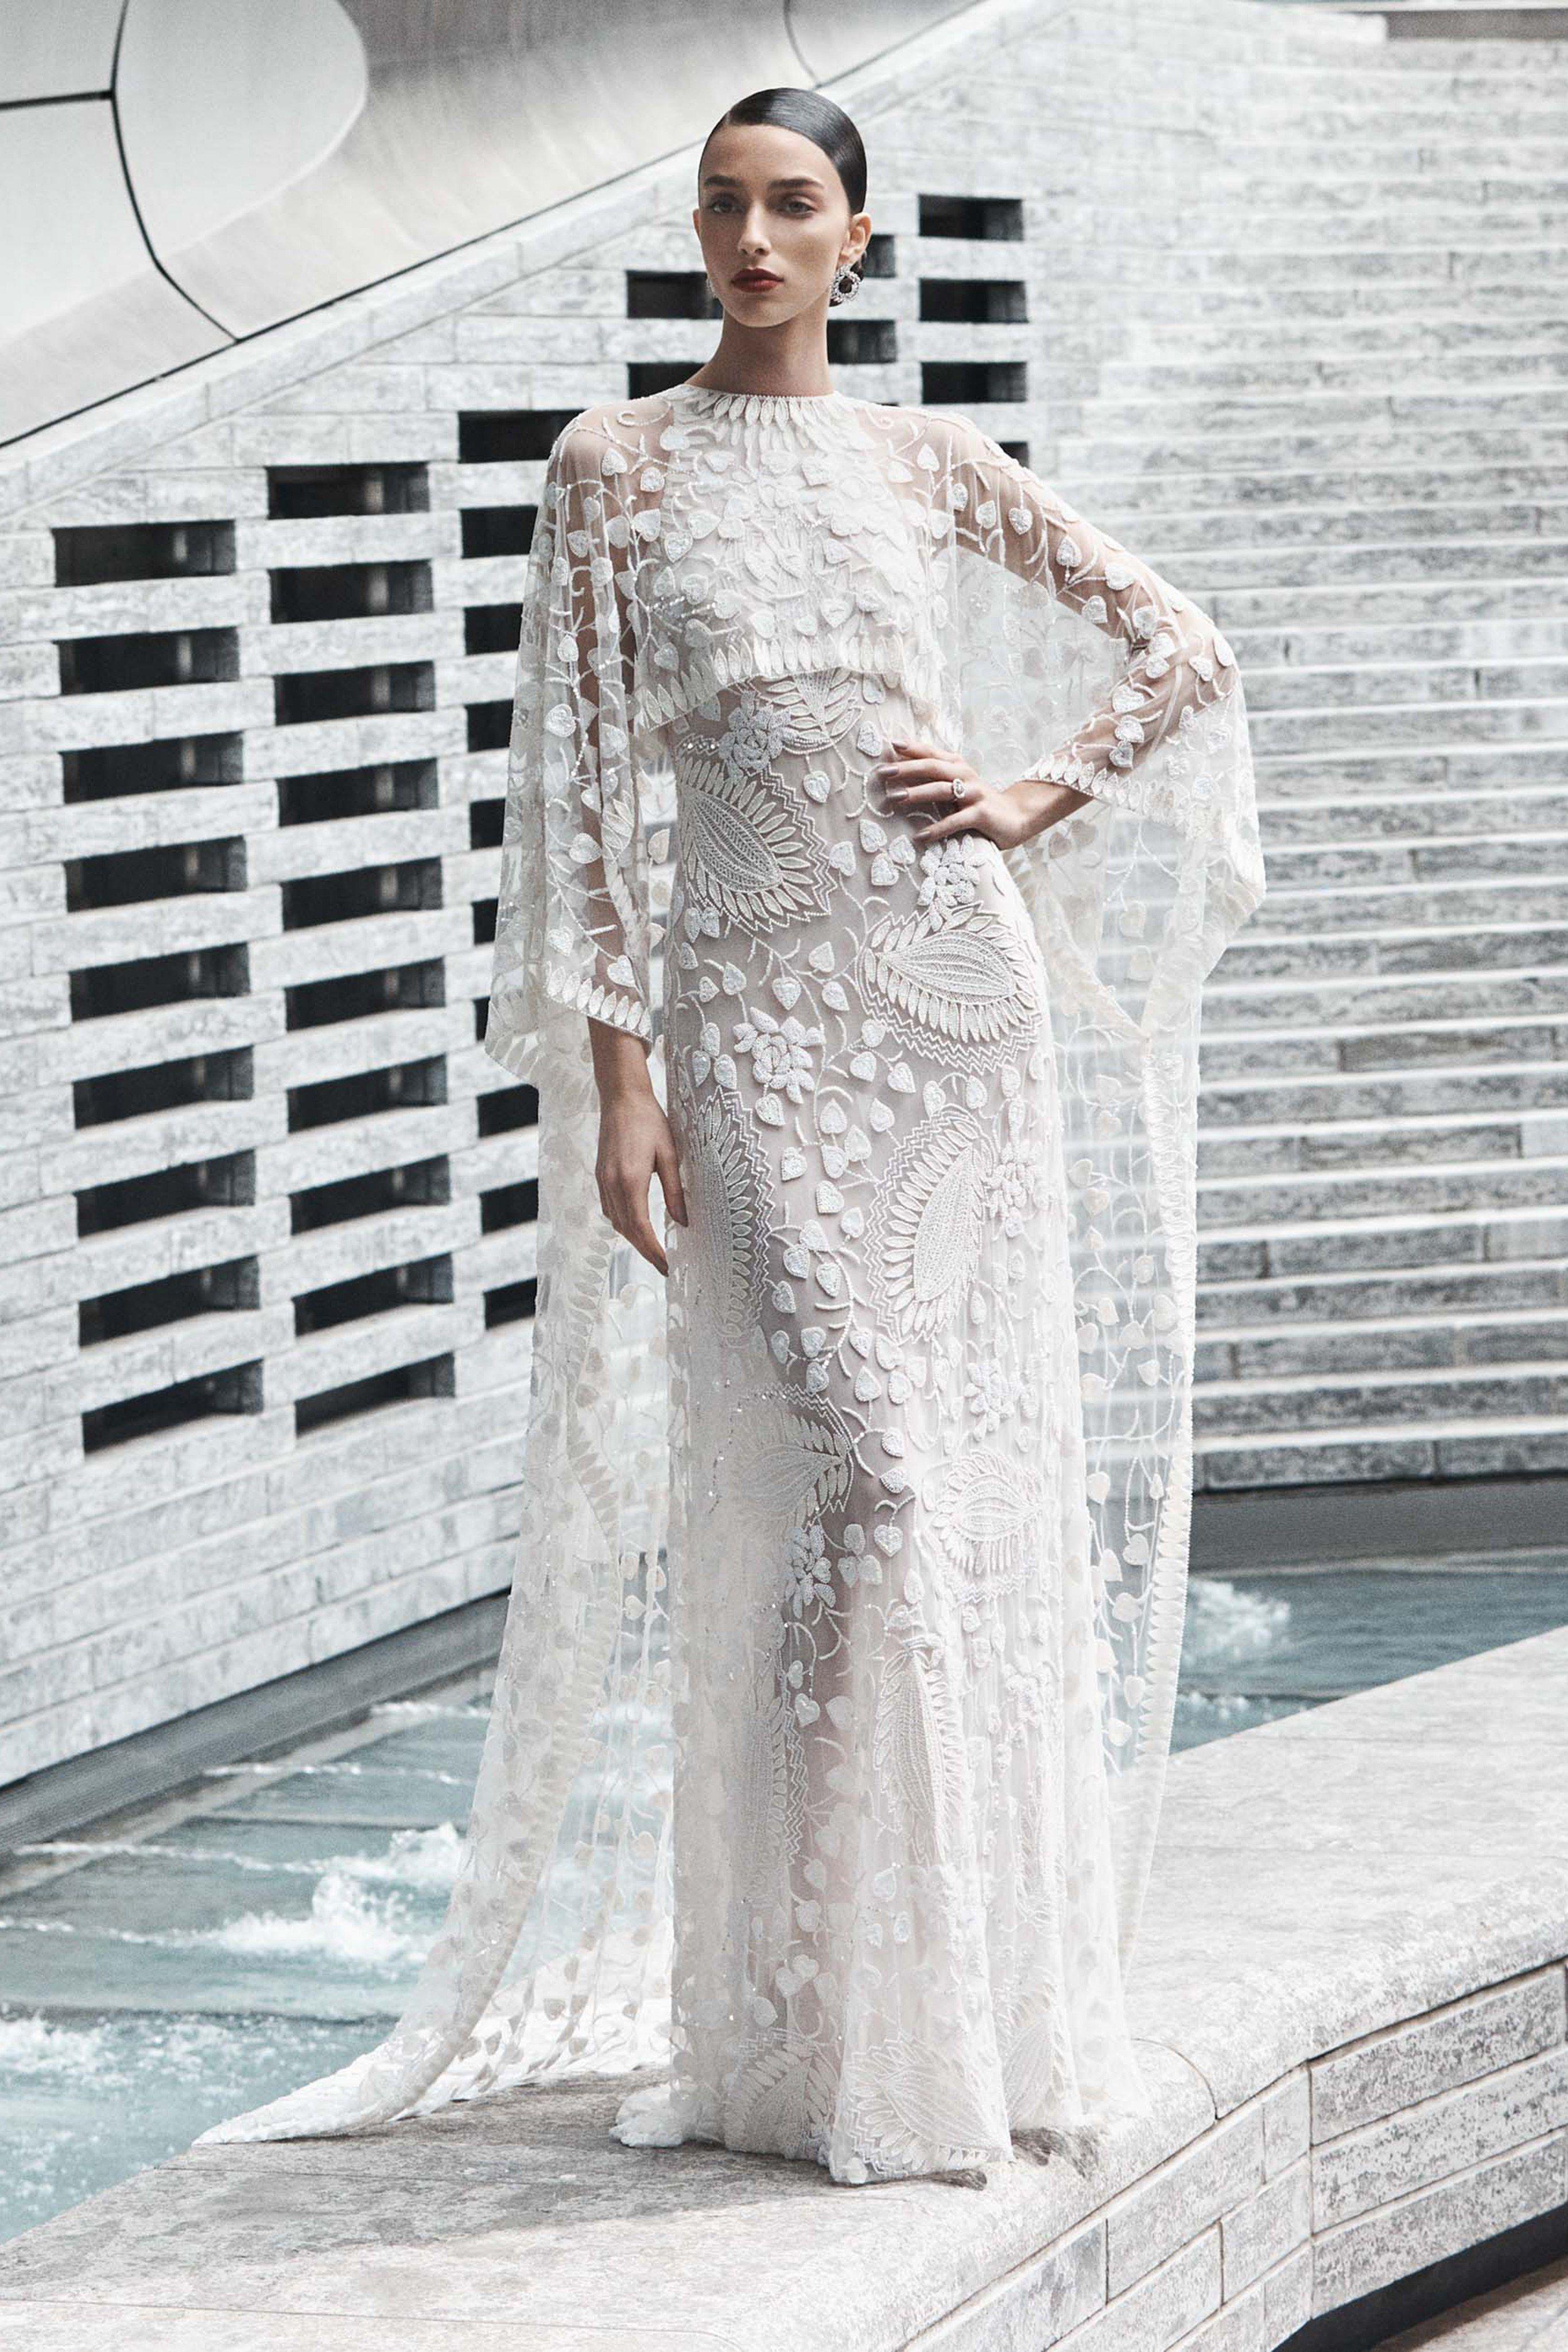 Lace dress in black august 2019 Naeem Khan Bridal Fall  Fashion Show  wedding dresses